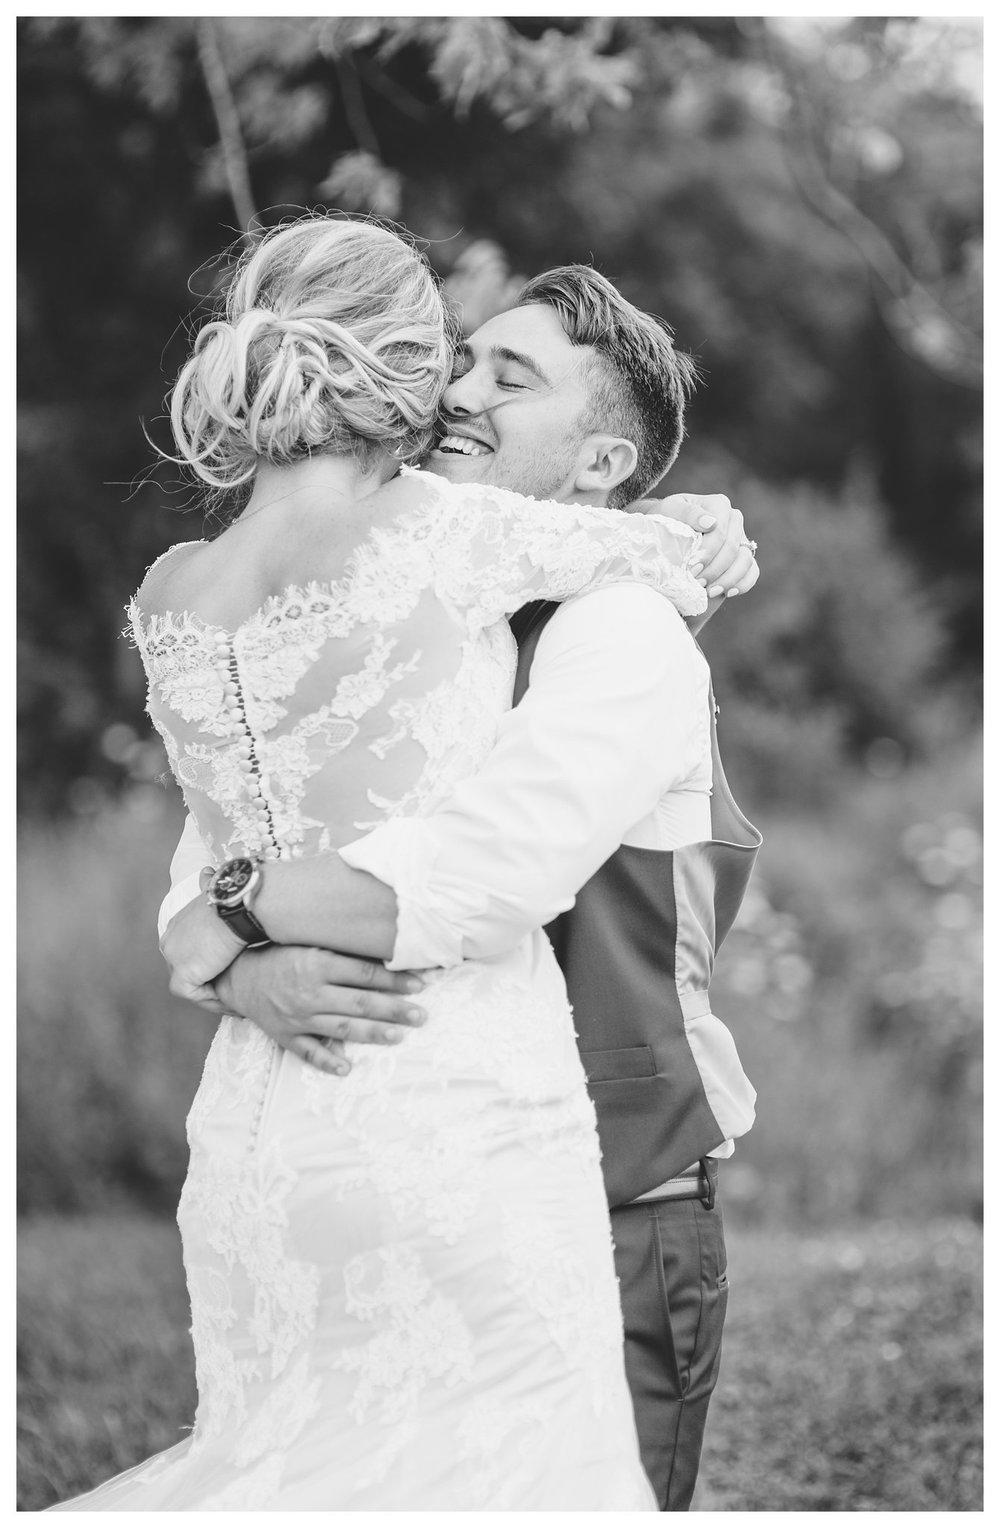 tower-park-mess-hall-everleigh-photography-northern-kentucky-wedding-photographer-25